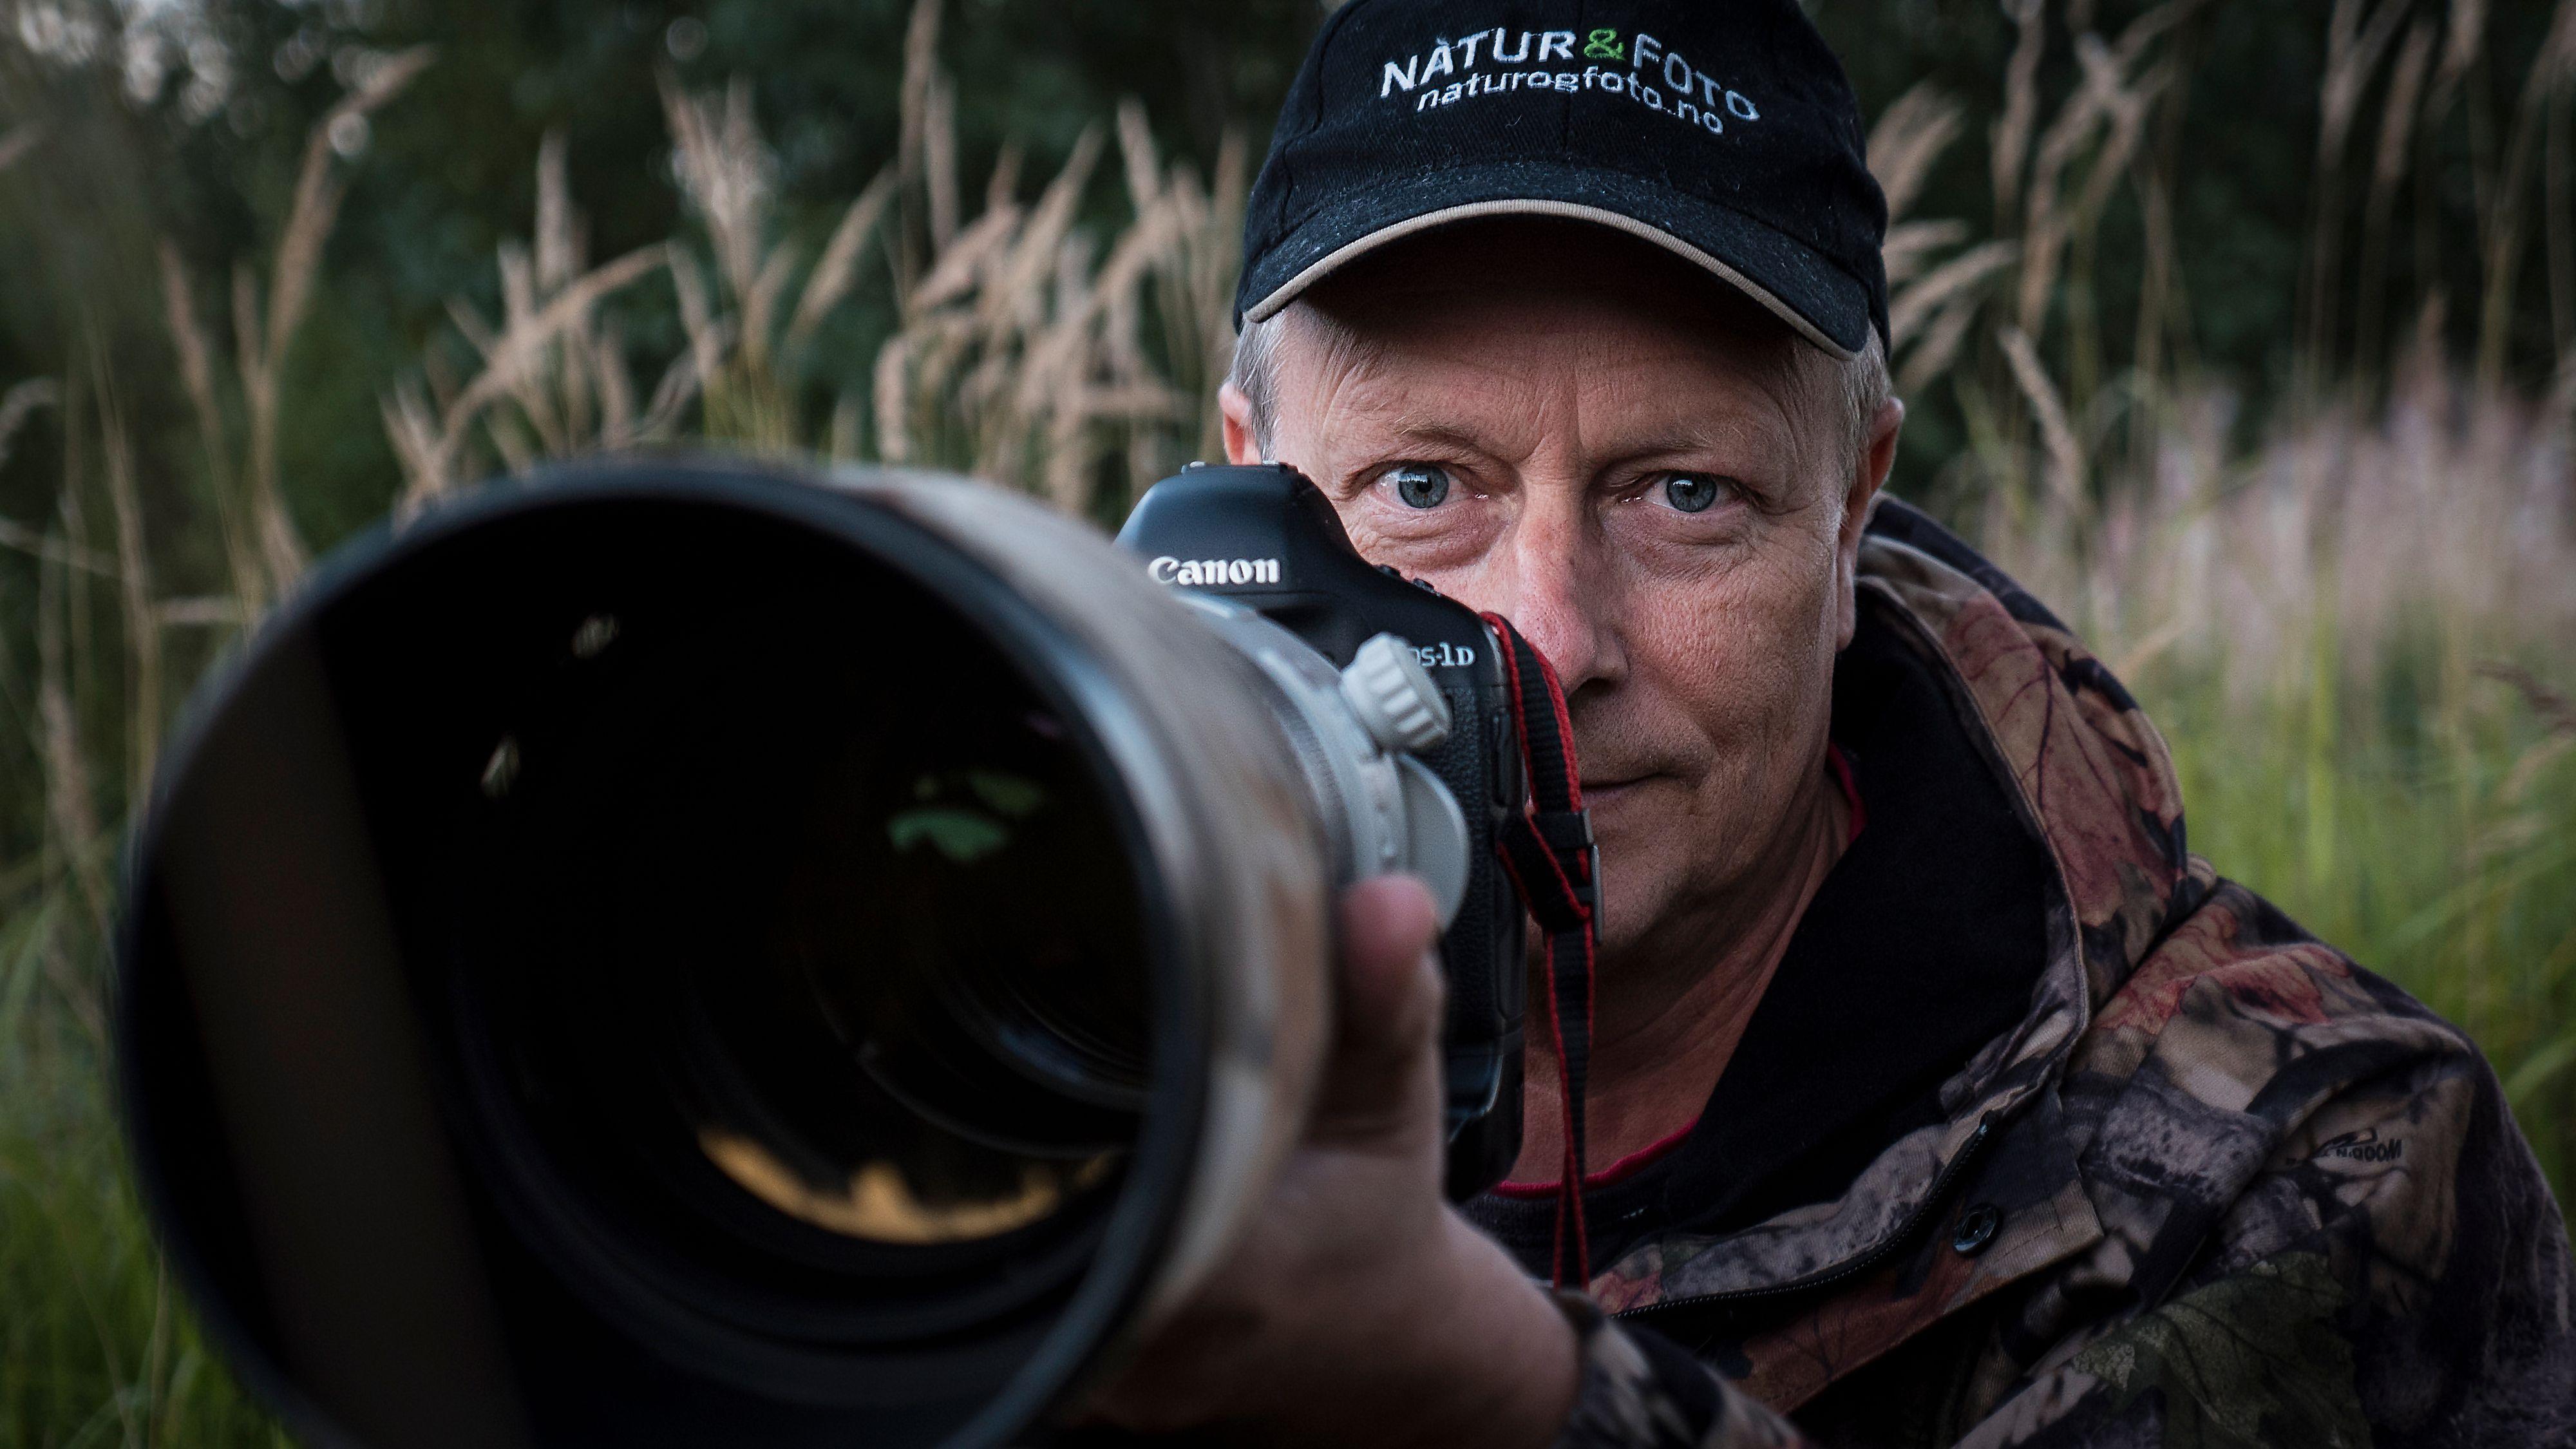 Baard Næss driver fotomagasinet Natur & Foto, har drevet med naturfotografi i en mannsalder, vunnet flere priser og skrevet flere bøker om natur og naturfoto. Foto: Kristoffer Møllevik